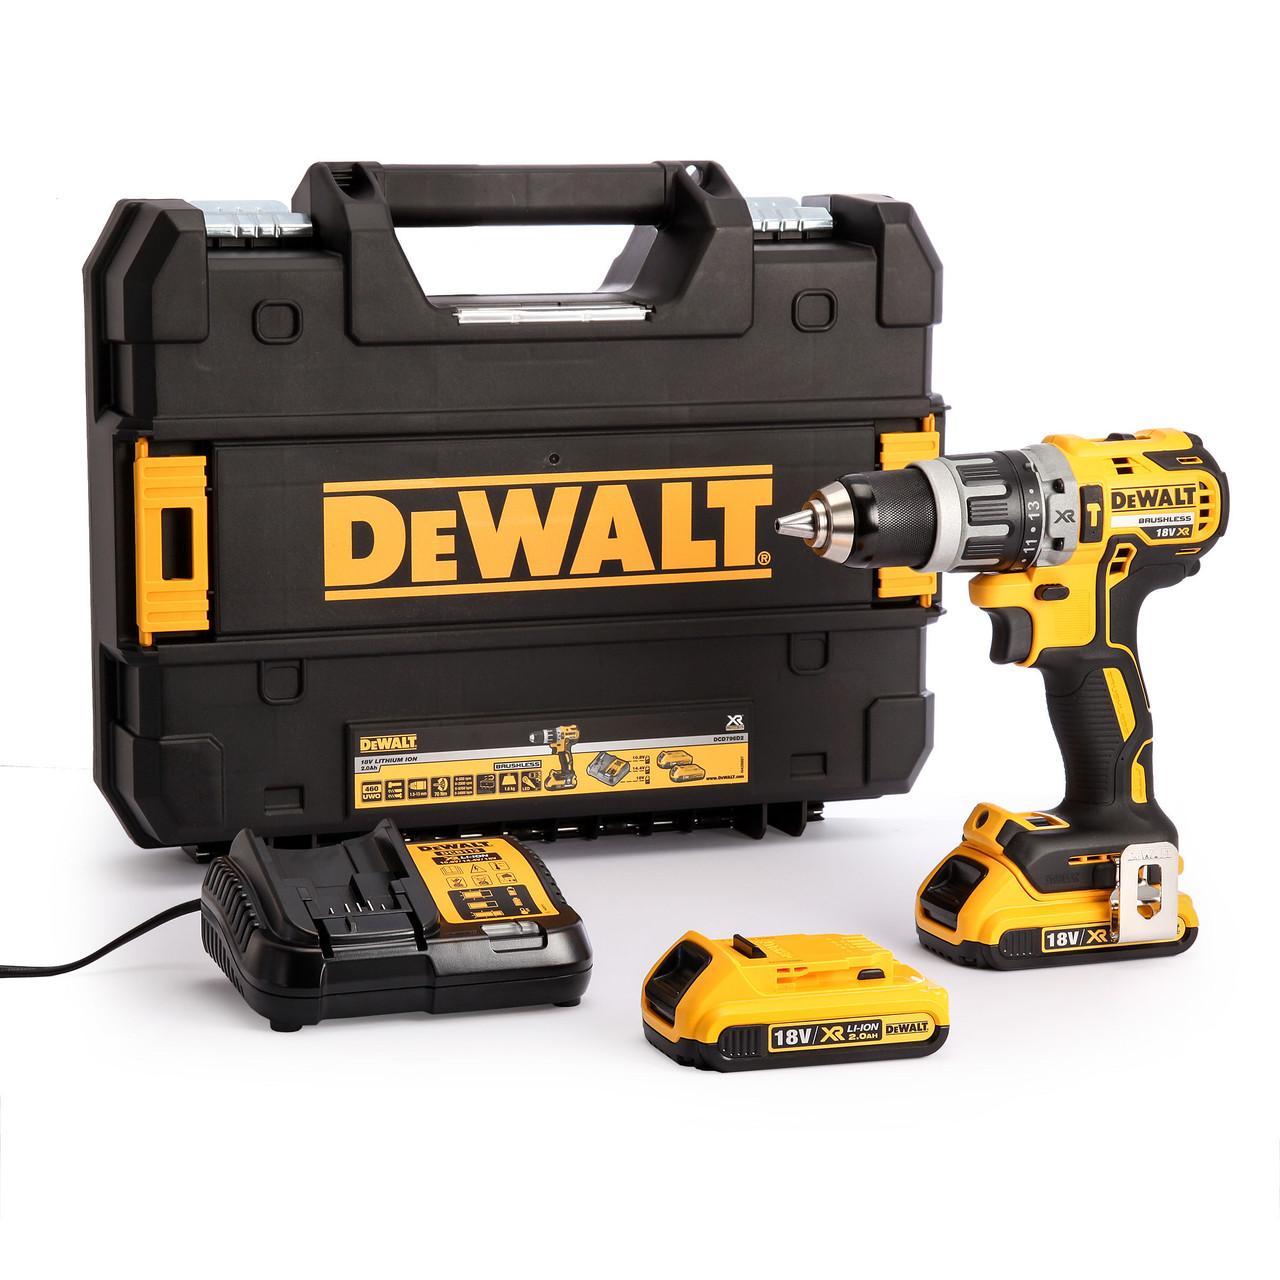 Dewalt DCD796P2 Combi Drill 18V XR Brushless Compact Li